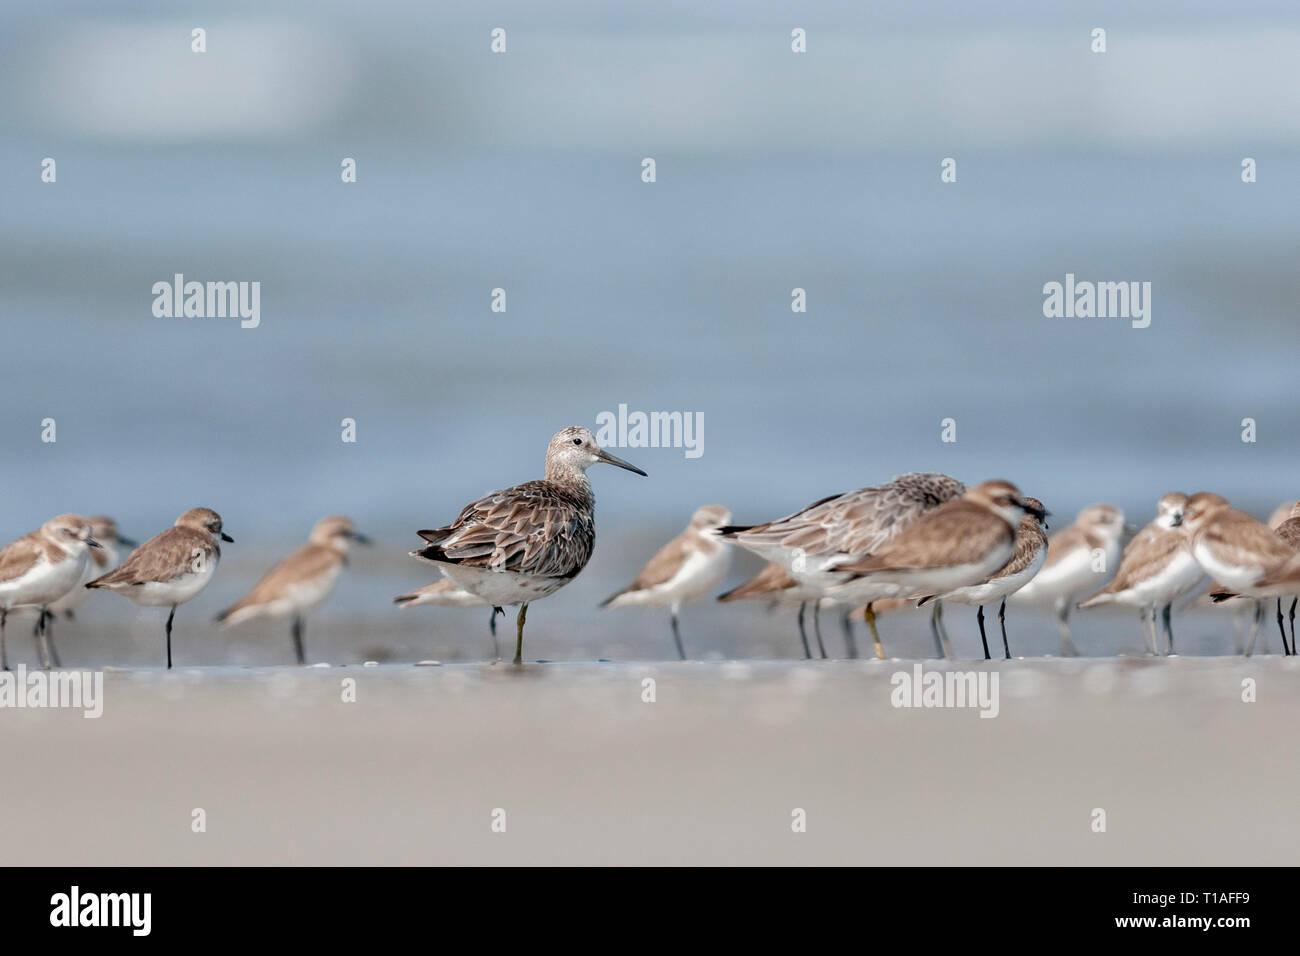 Ruff in Non breeding Plumage at Akshi Beach,Maharashtra,India - Stock Image